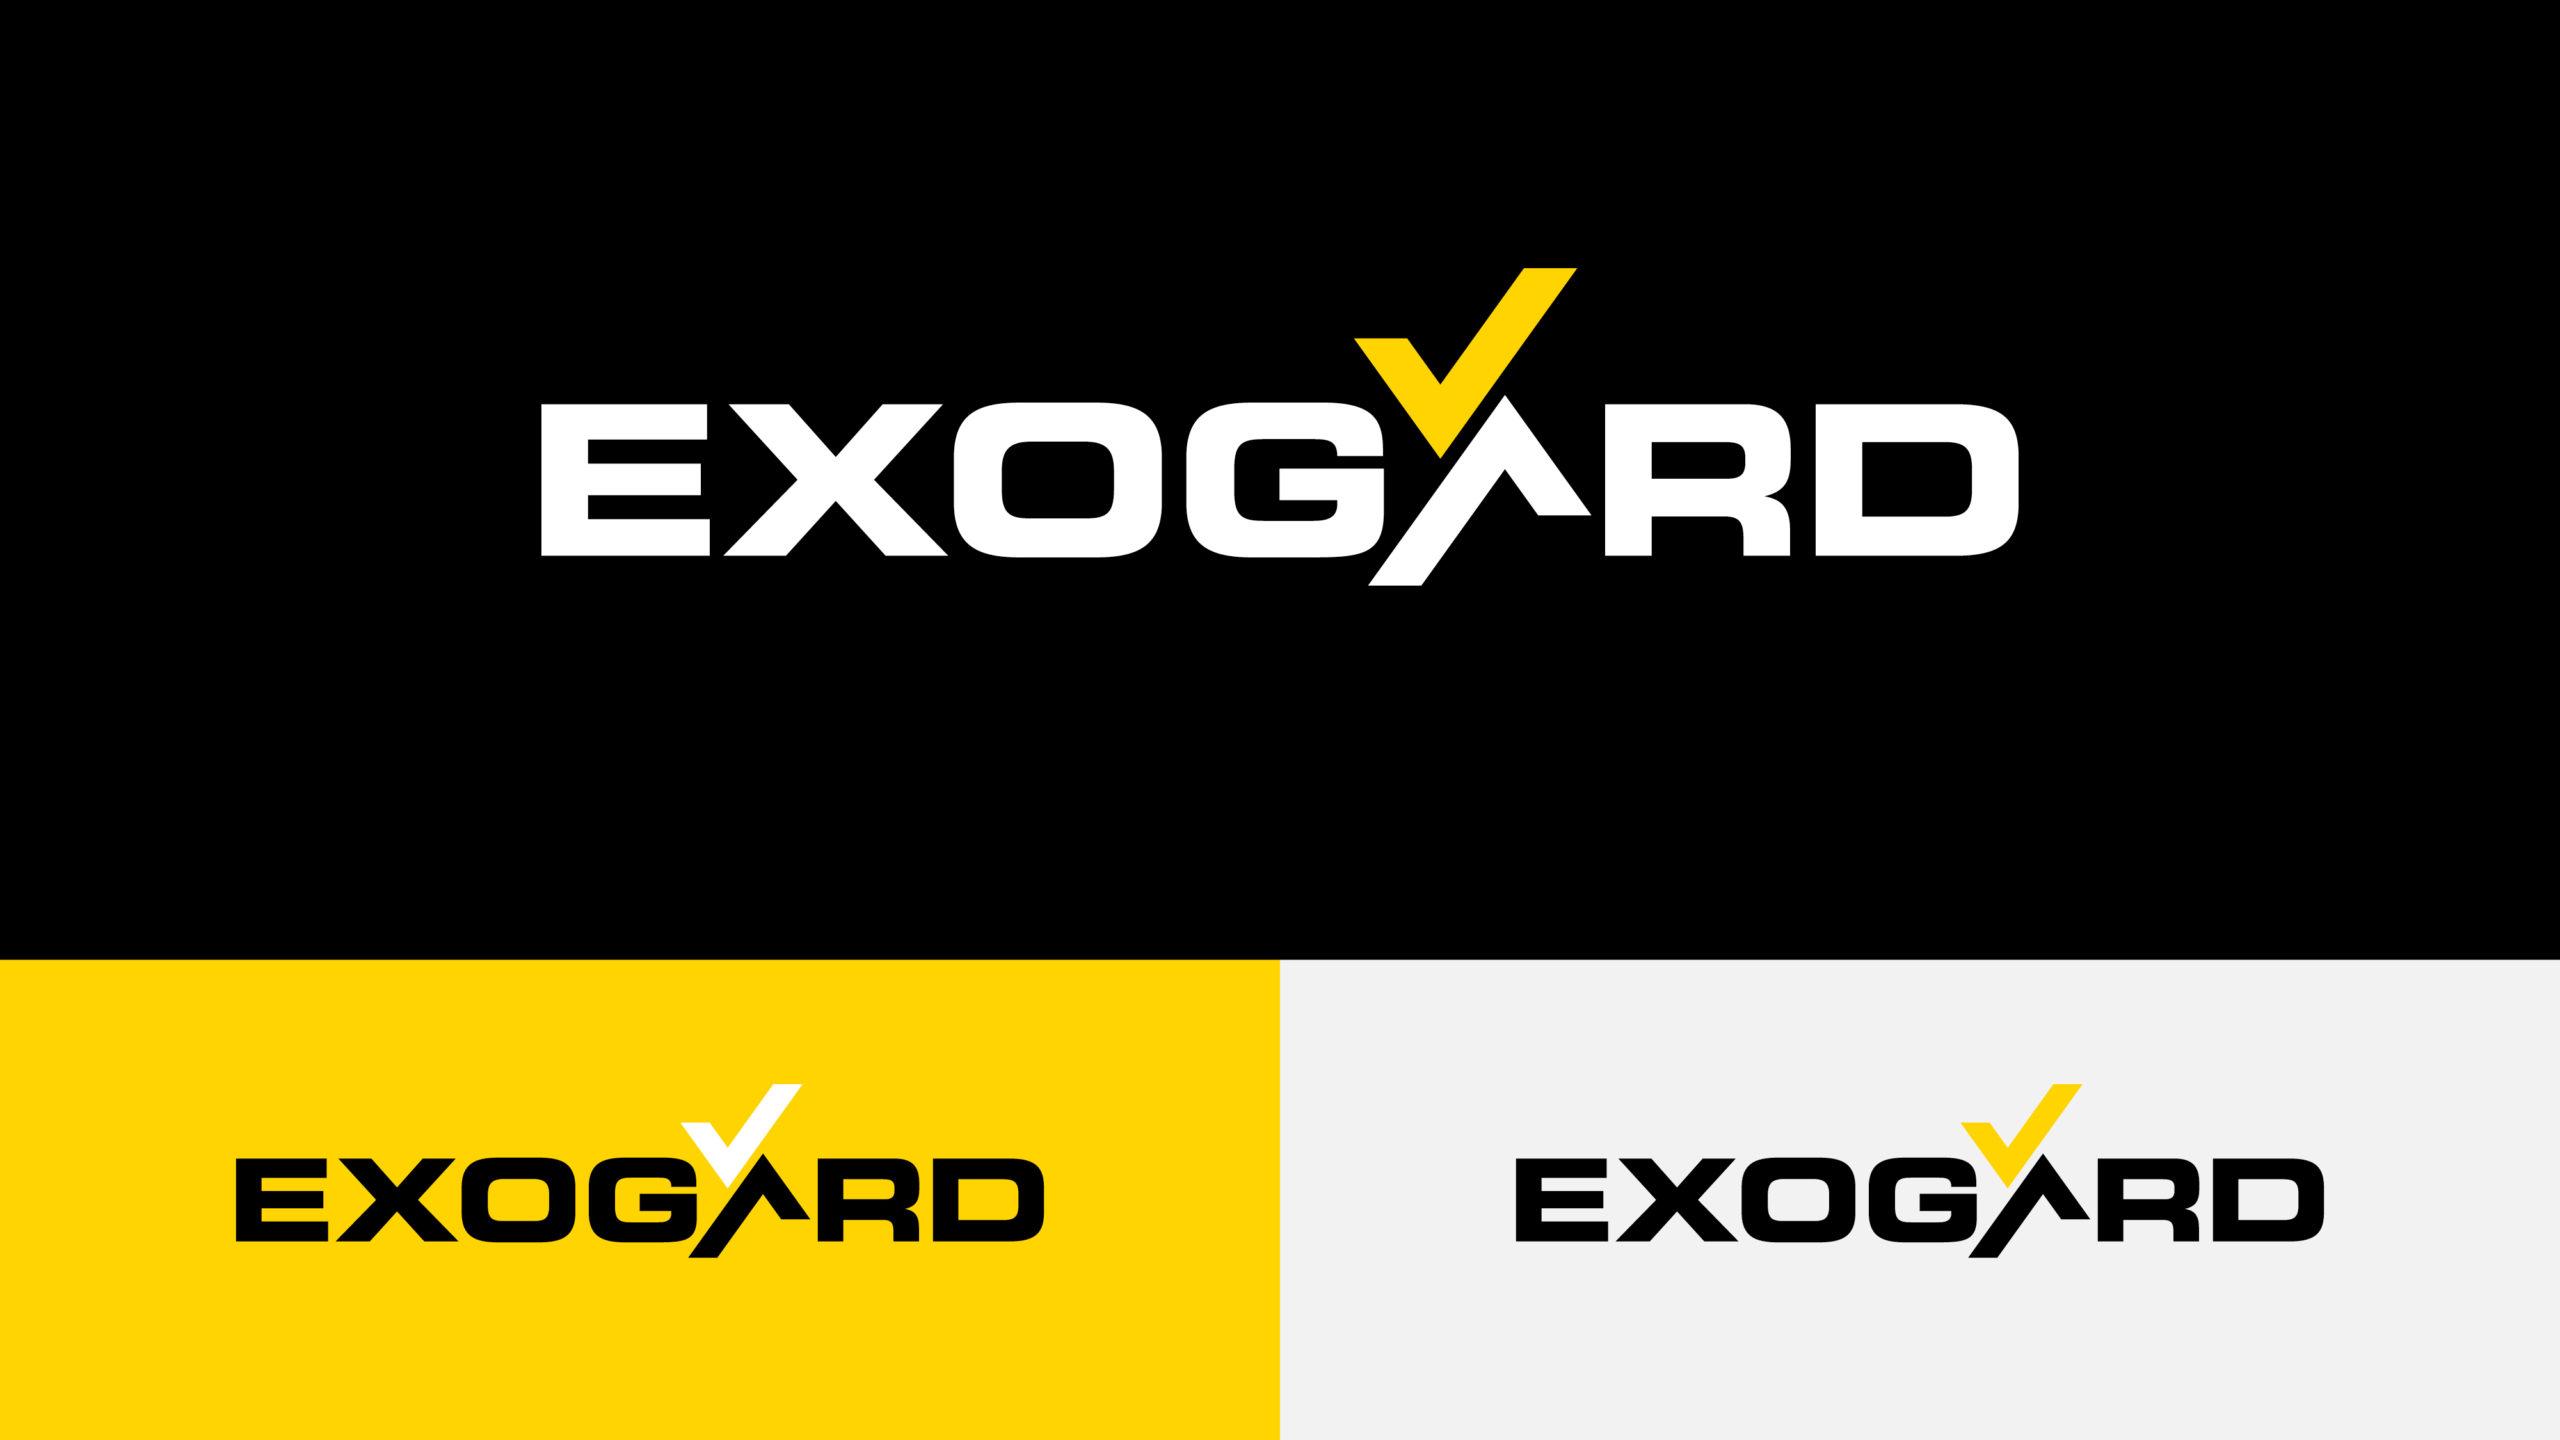 Exogard Visual Identity Logo